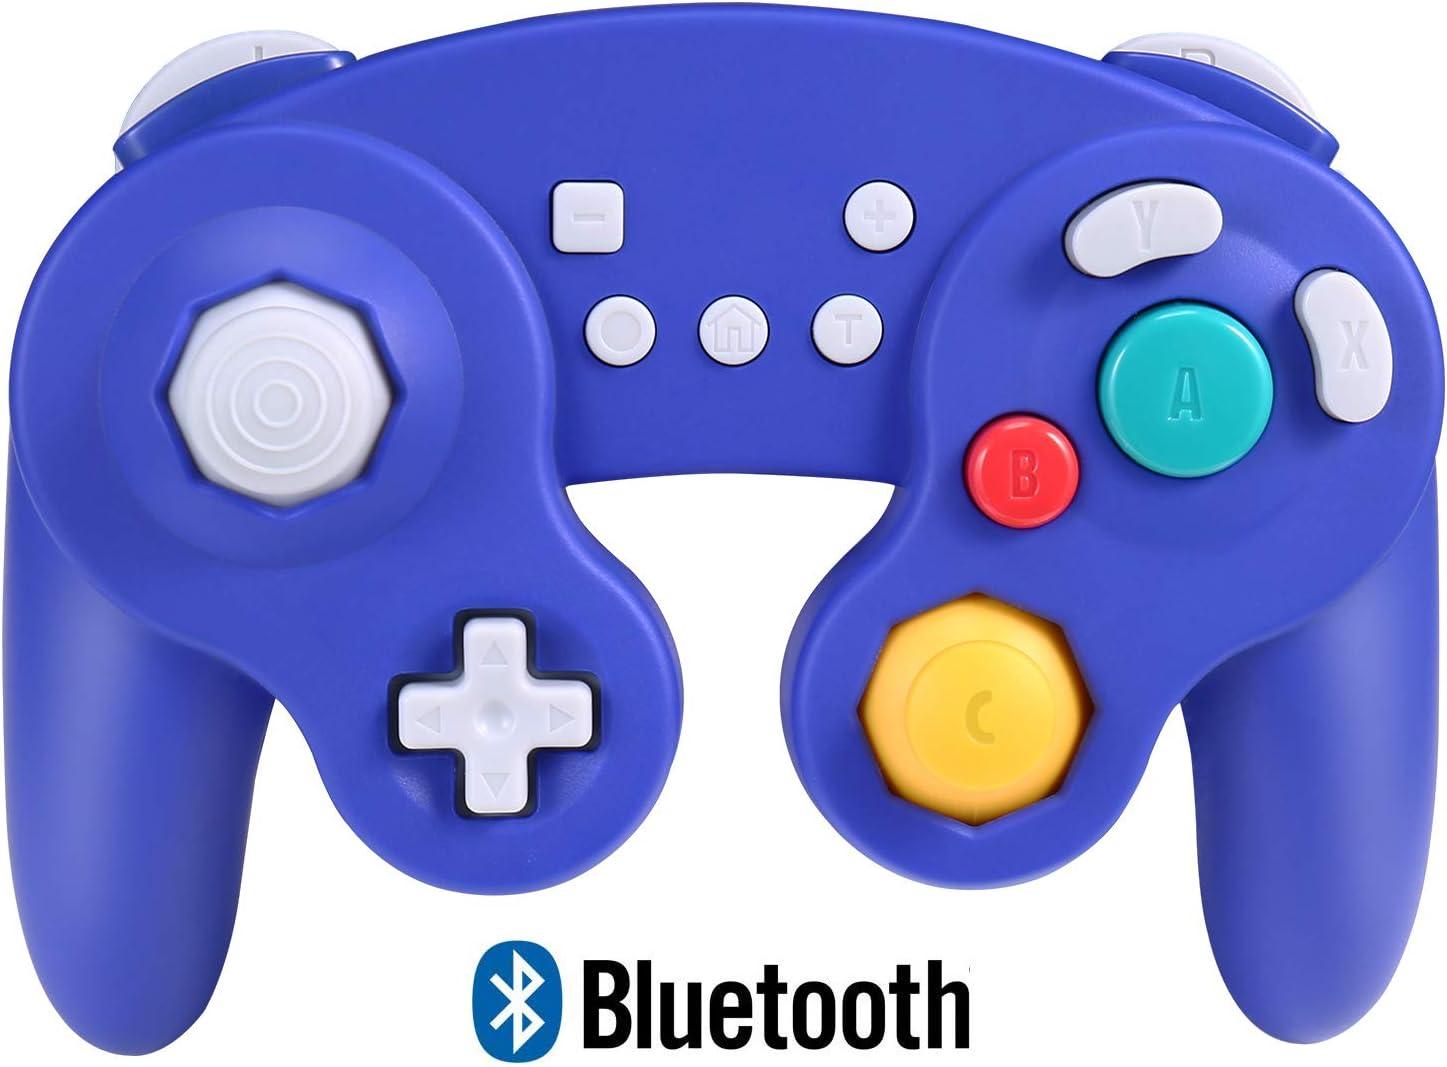 Exlene Wireless Controller Gamepad para Nintendo Switch, Recargable, Compatible con PC / PS3, GameCube Estilo, Motion Controls, Rumble, Turbo (Azul)